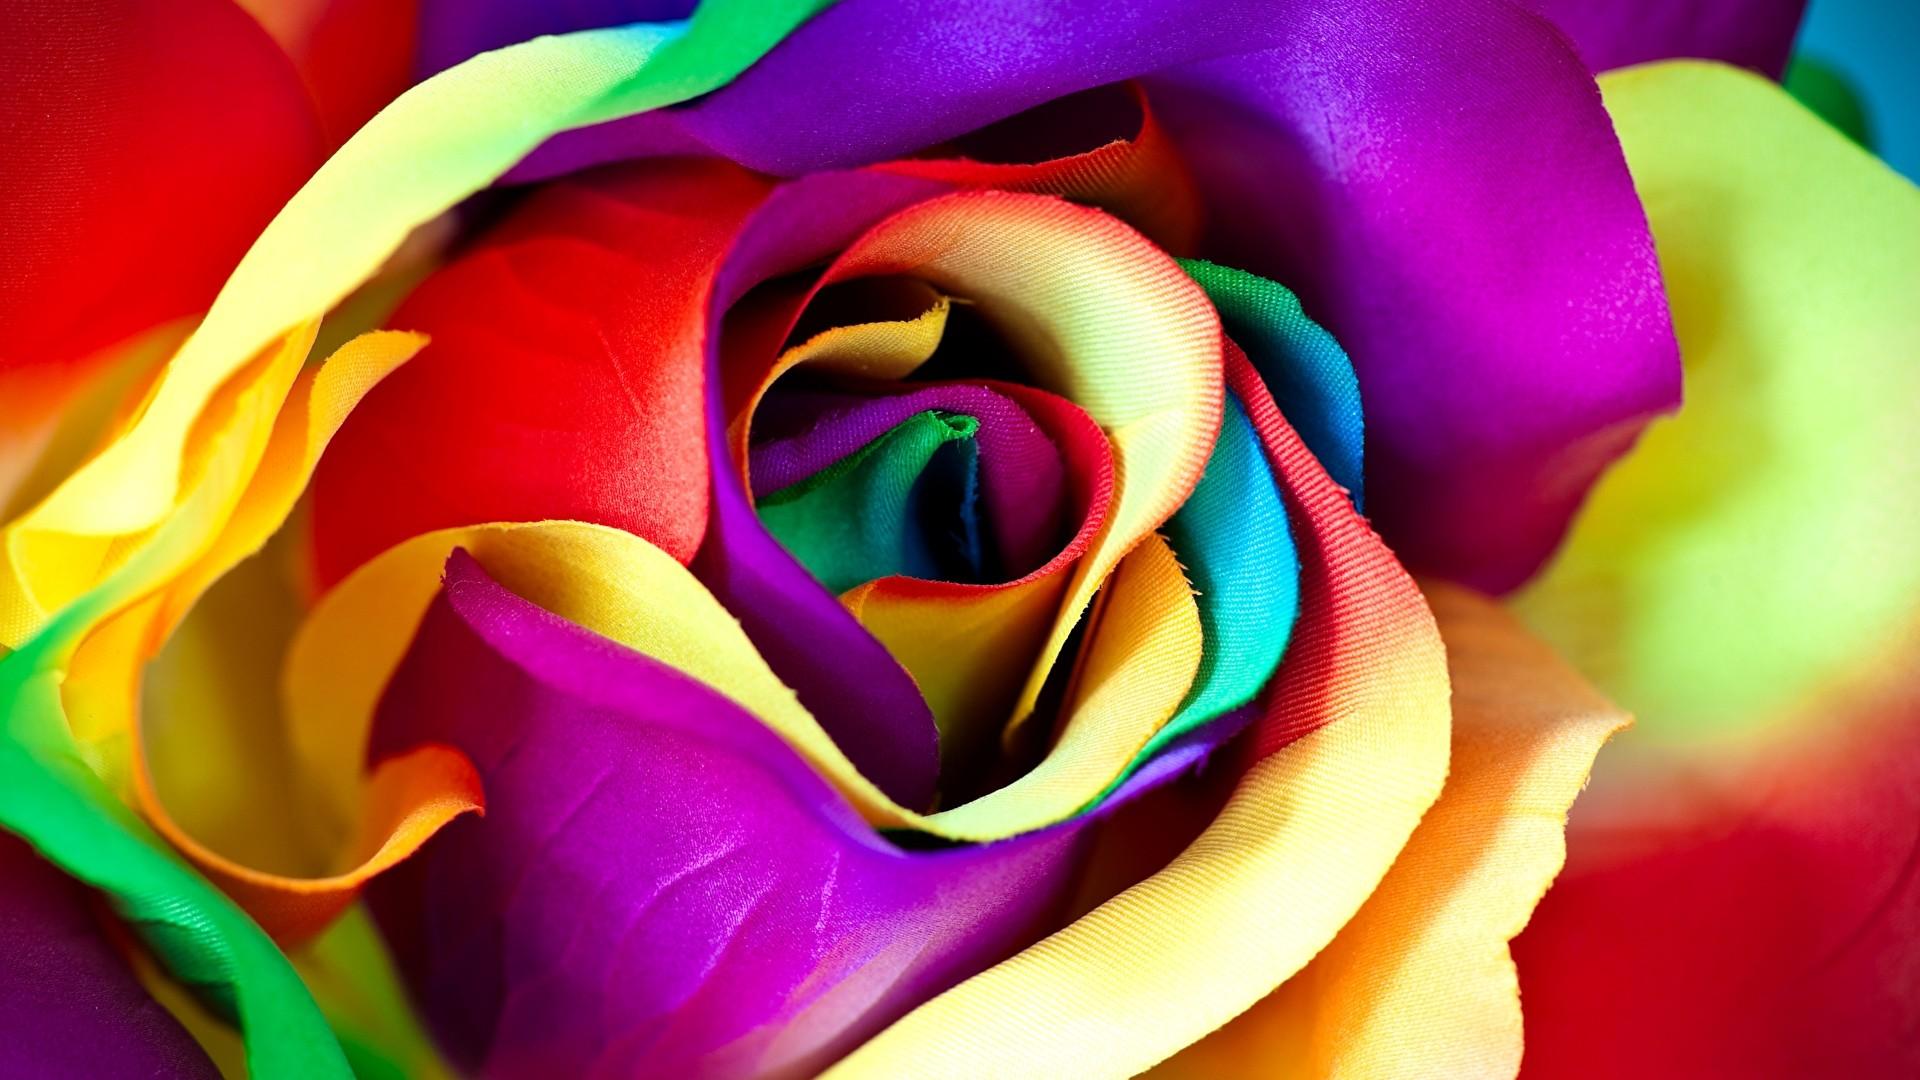 Rainbow Rose HD Wallpaper